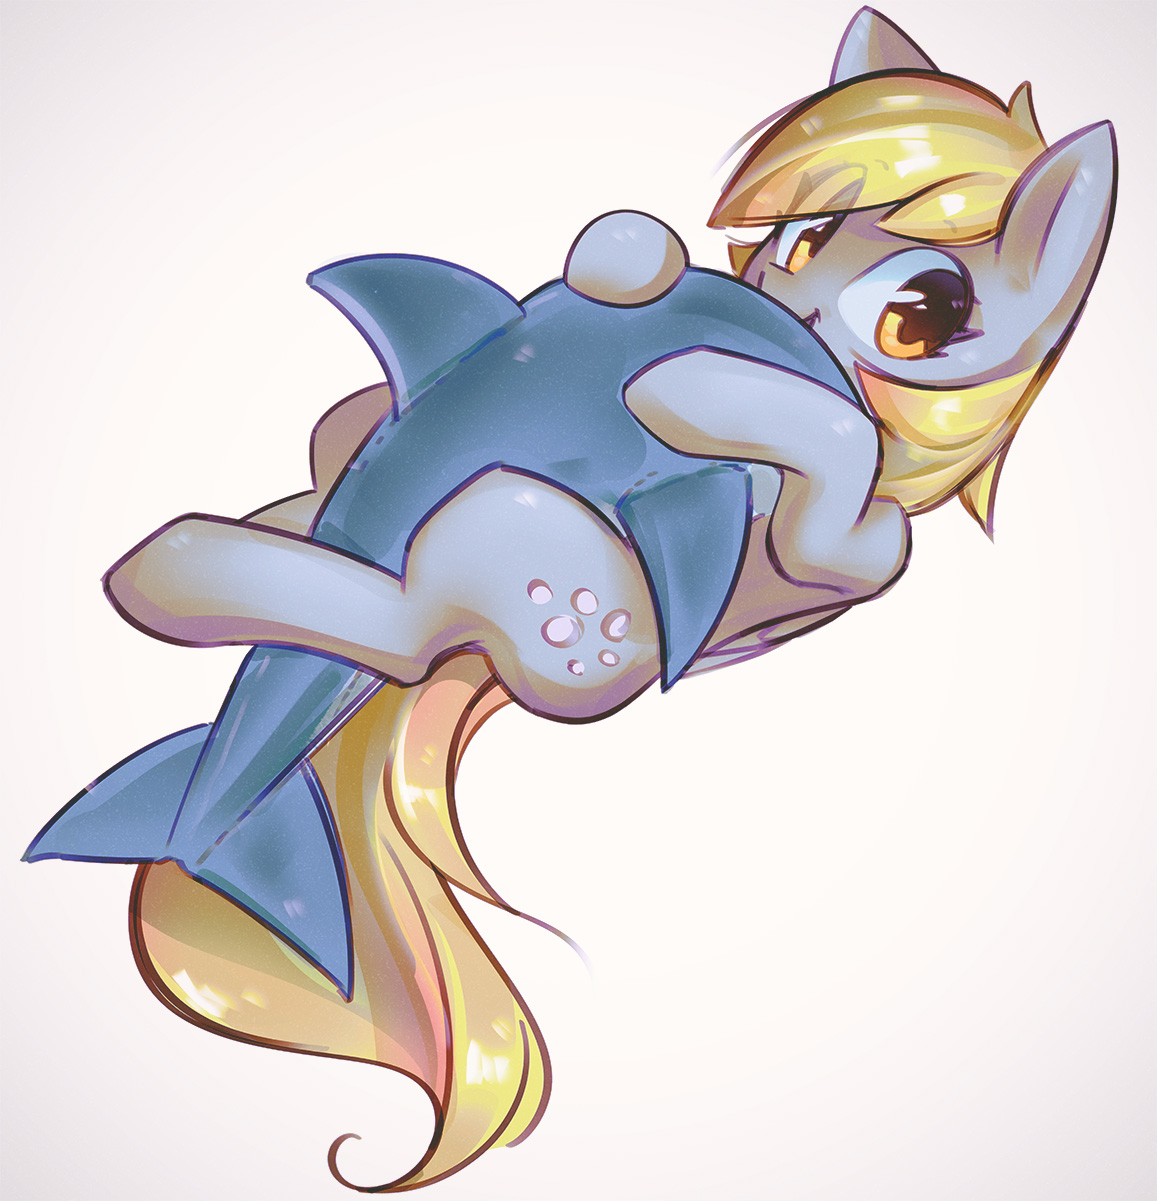 Dolphin Plush by mirroredsea